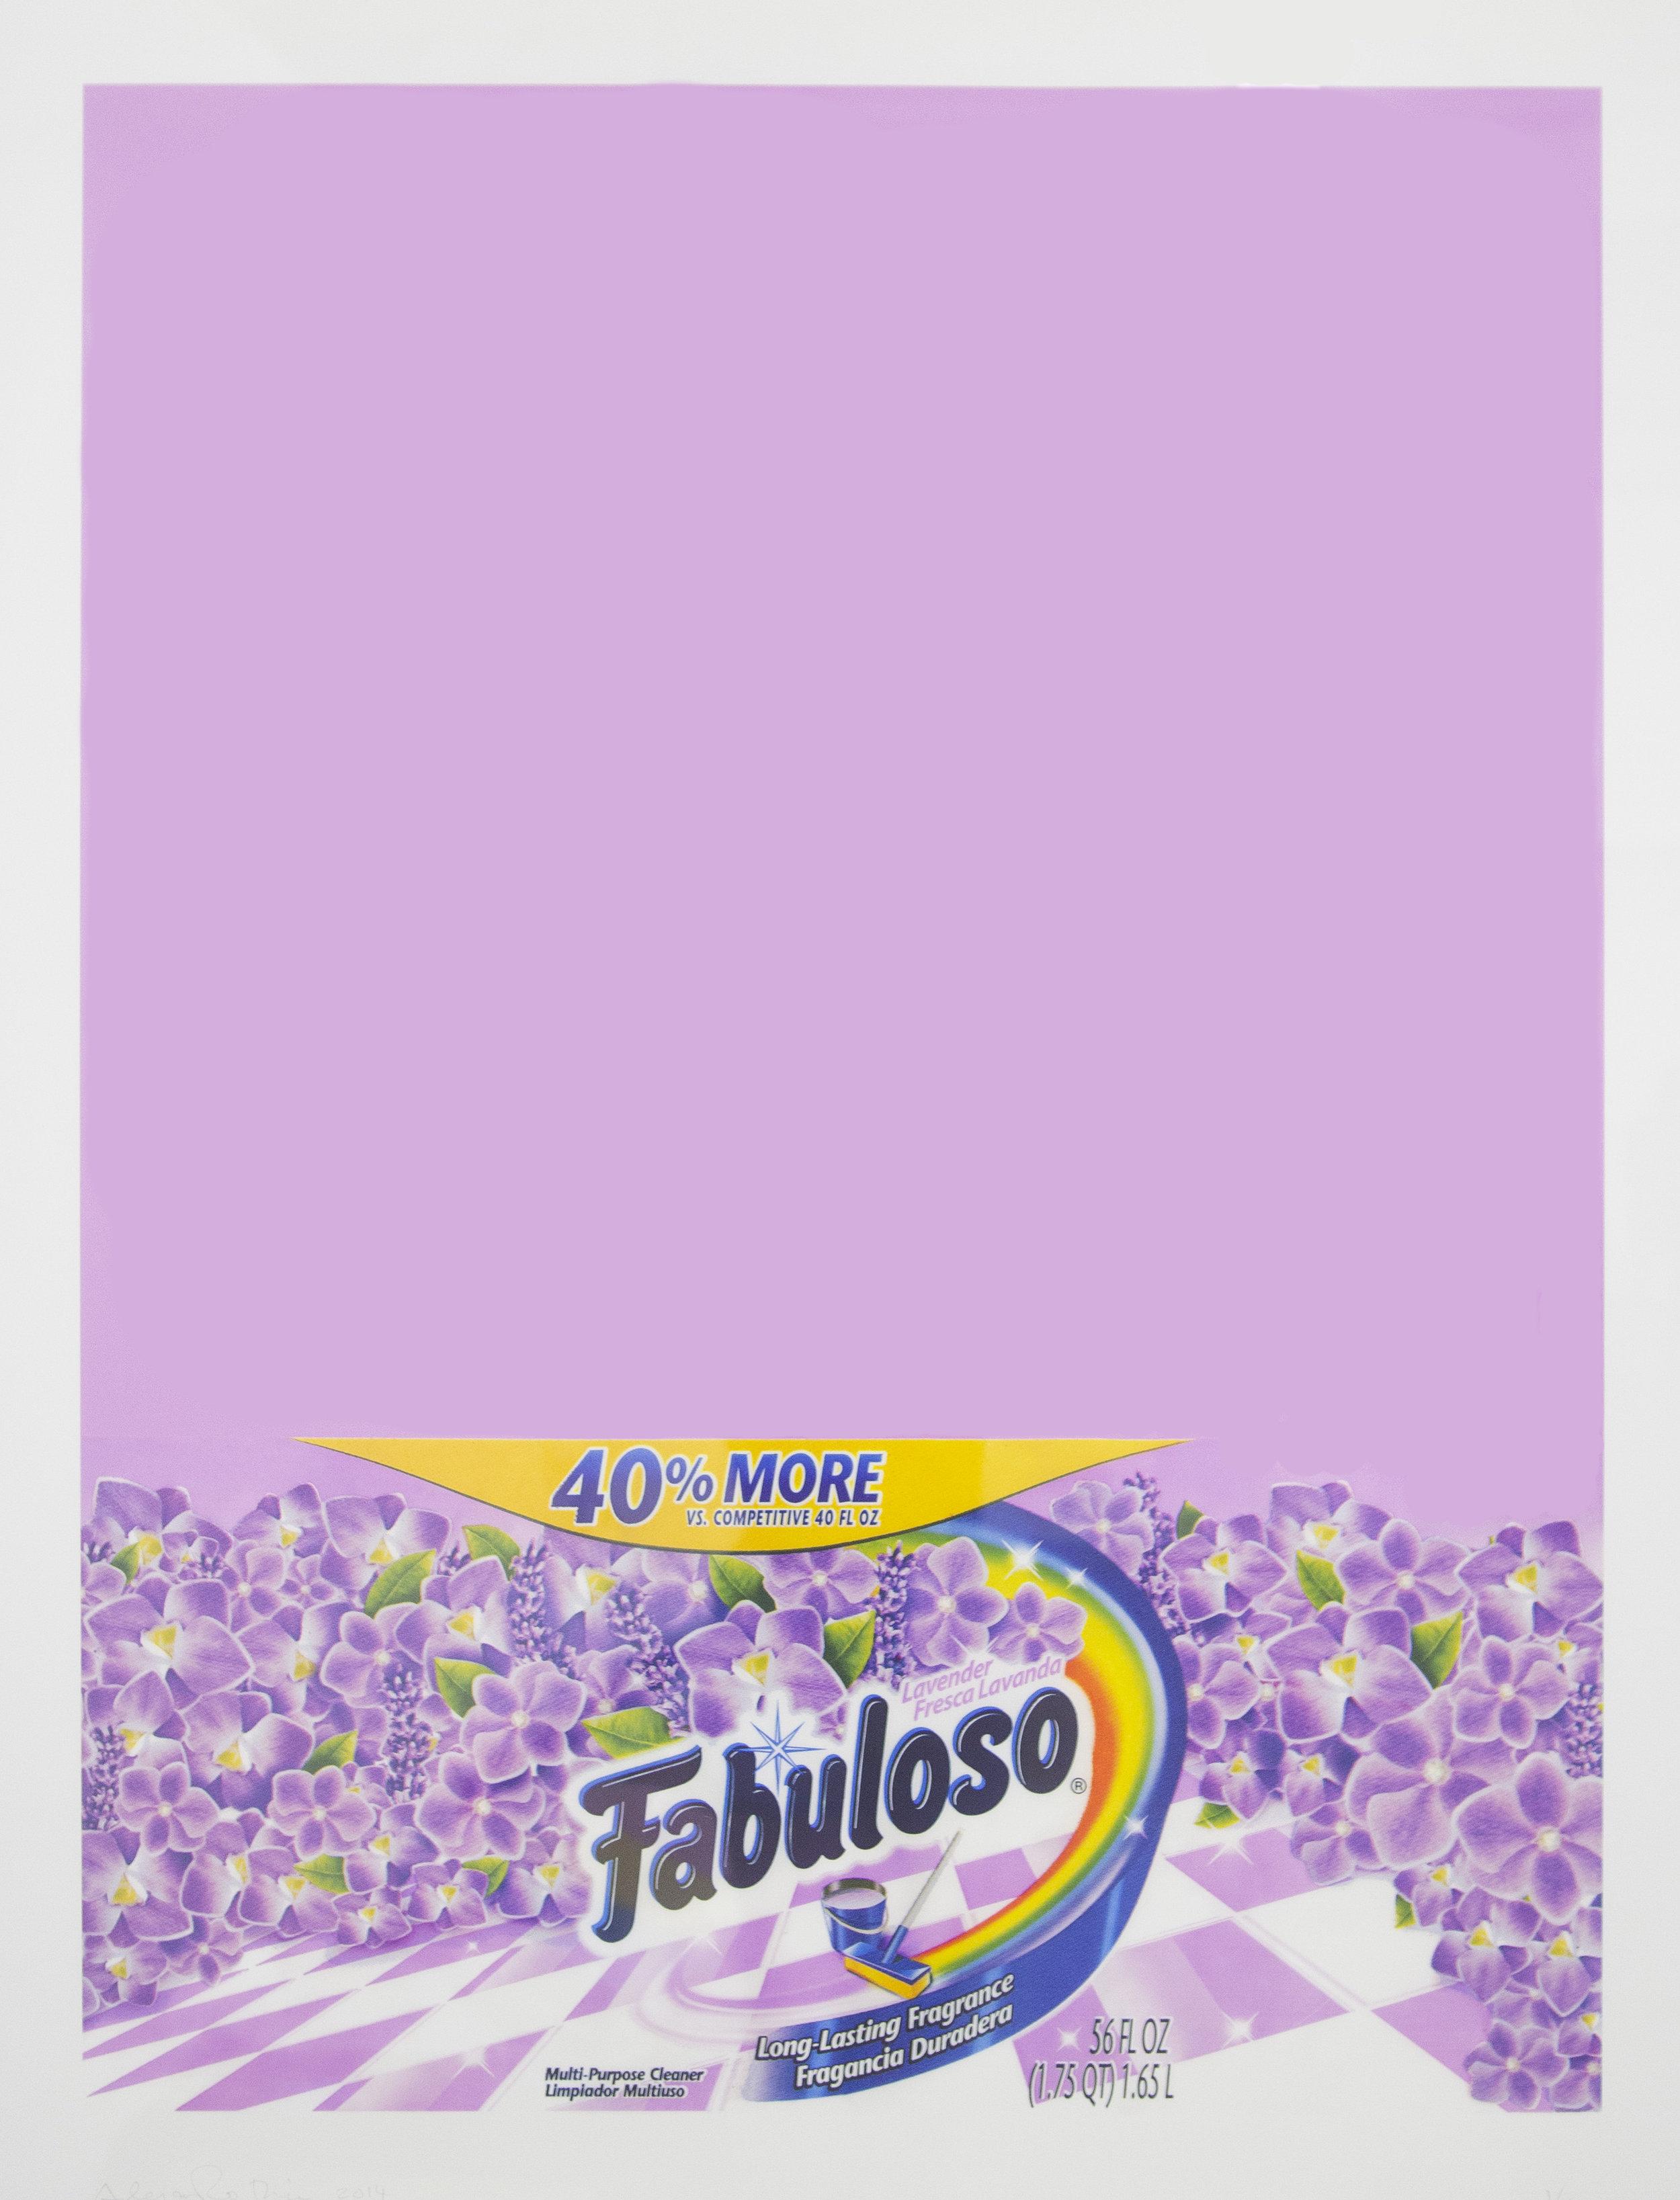 Alejandro Diaz  Fabuloso (Lavender) , 2014 giclee print on Hahnemuhle photo rag paper 42 x 36 in (106.7 x 91.4 cm)